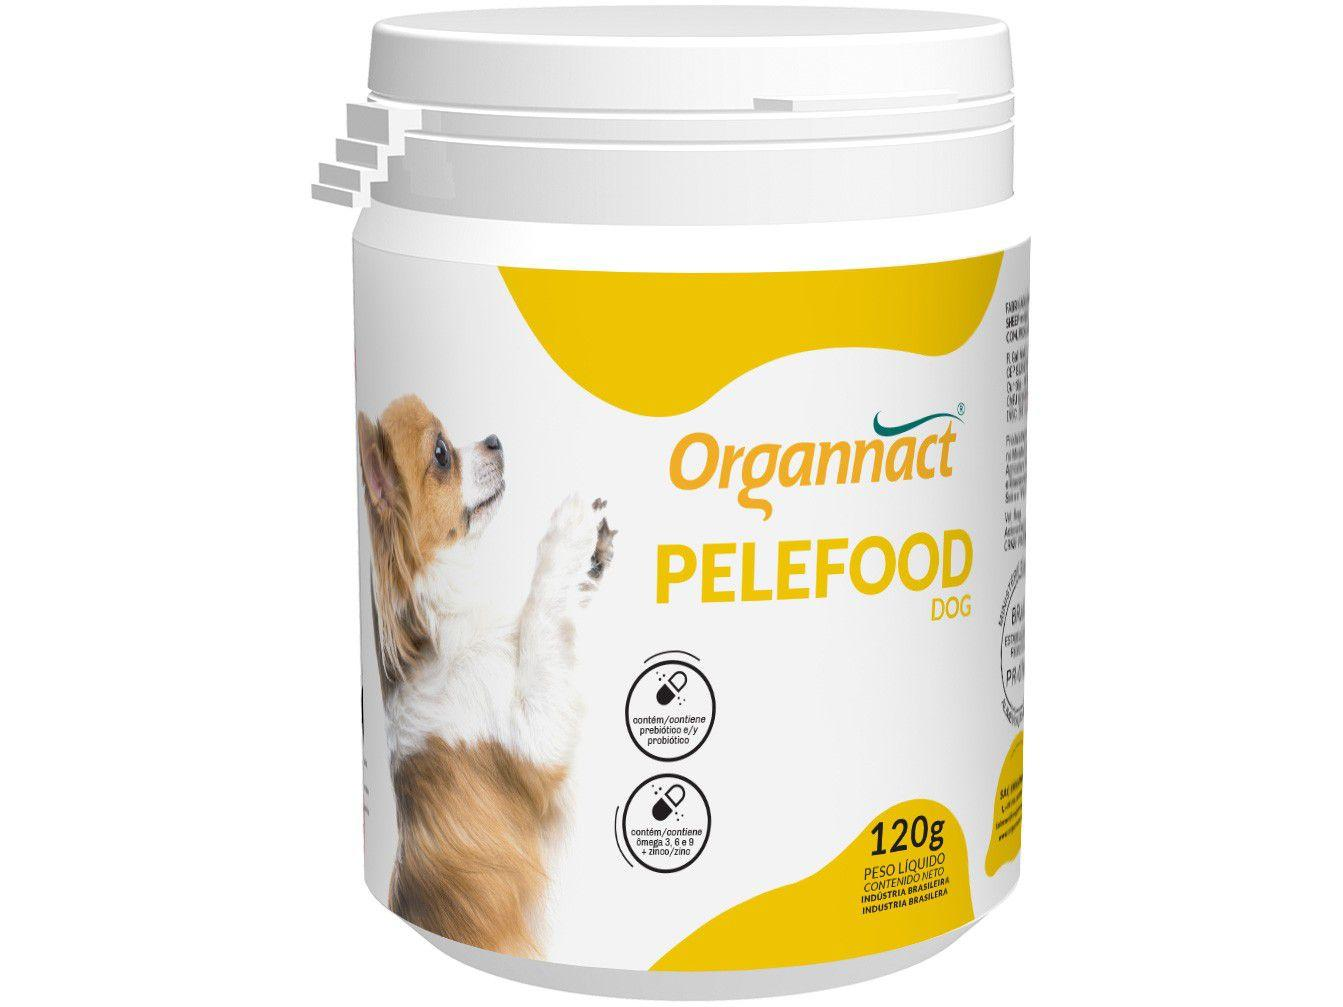 Suplemento Organnact Pelefood Dog - para Cachorro 120g